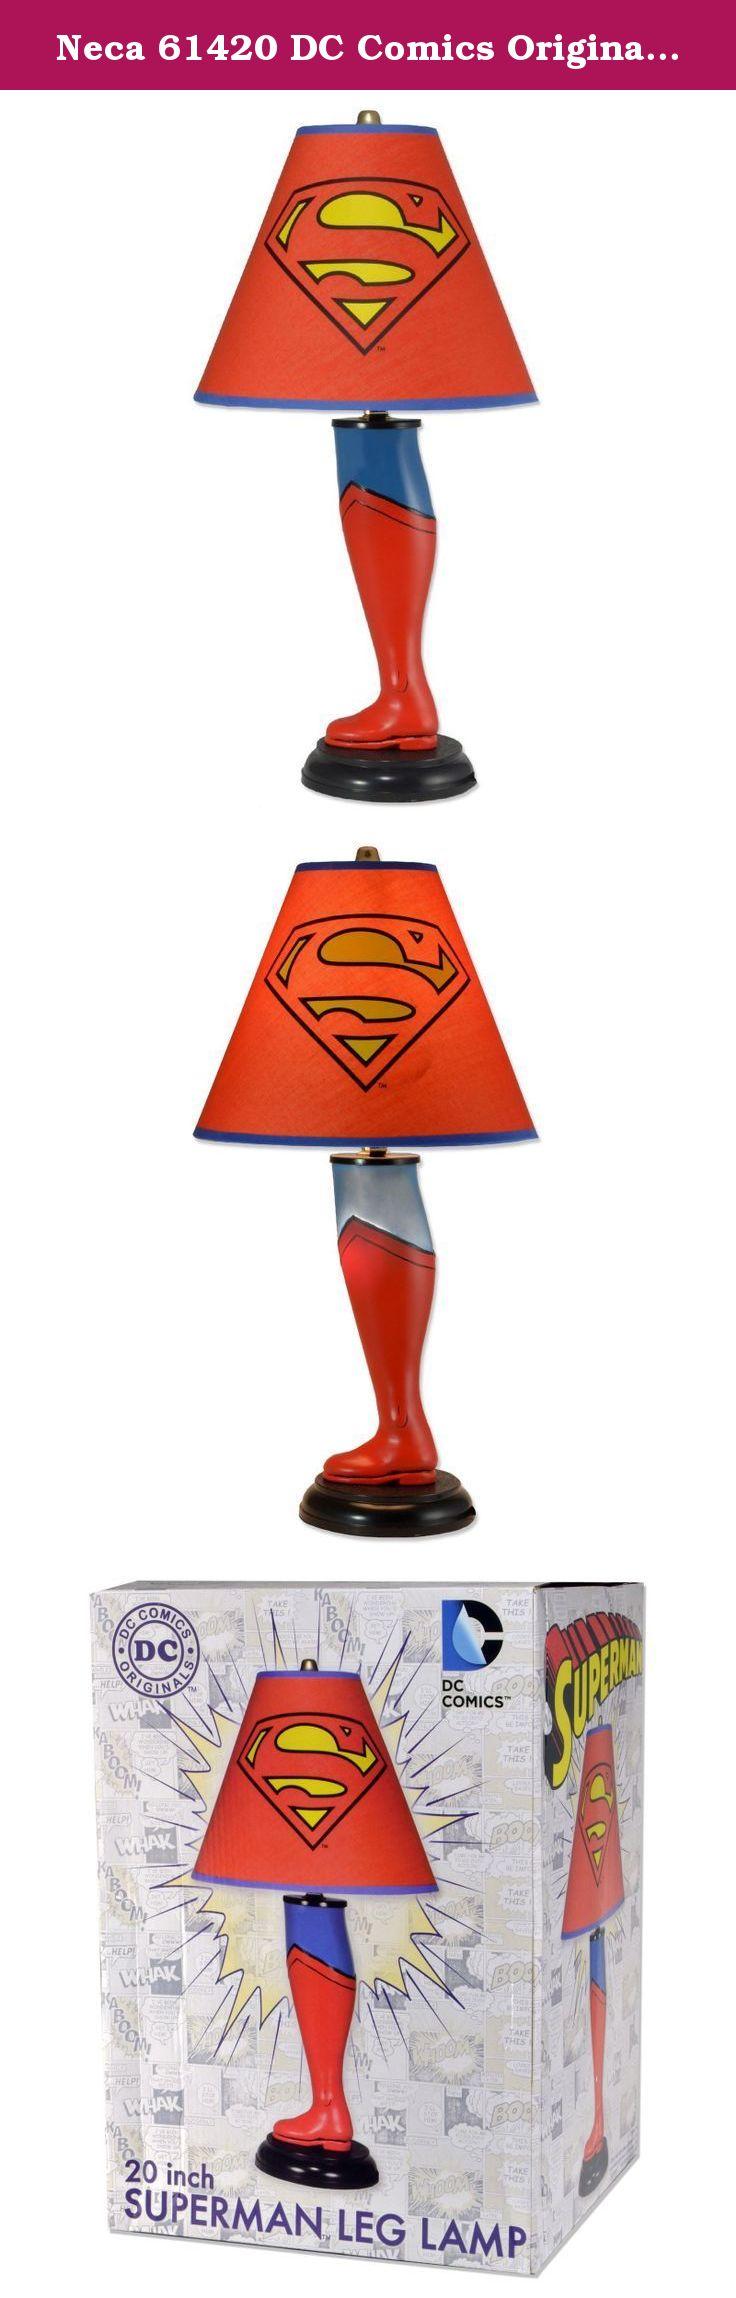 Neca 61420 DC Comics Originals 20Inch Superman Leg Lamp